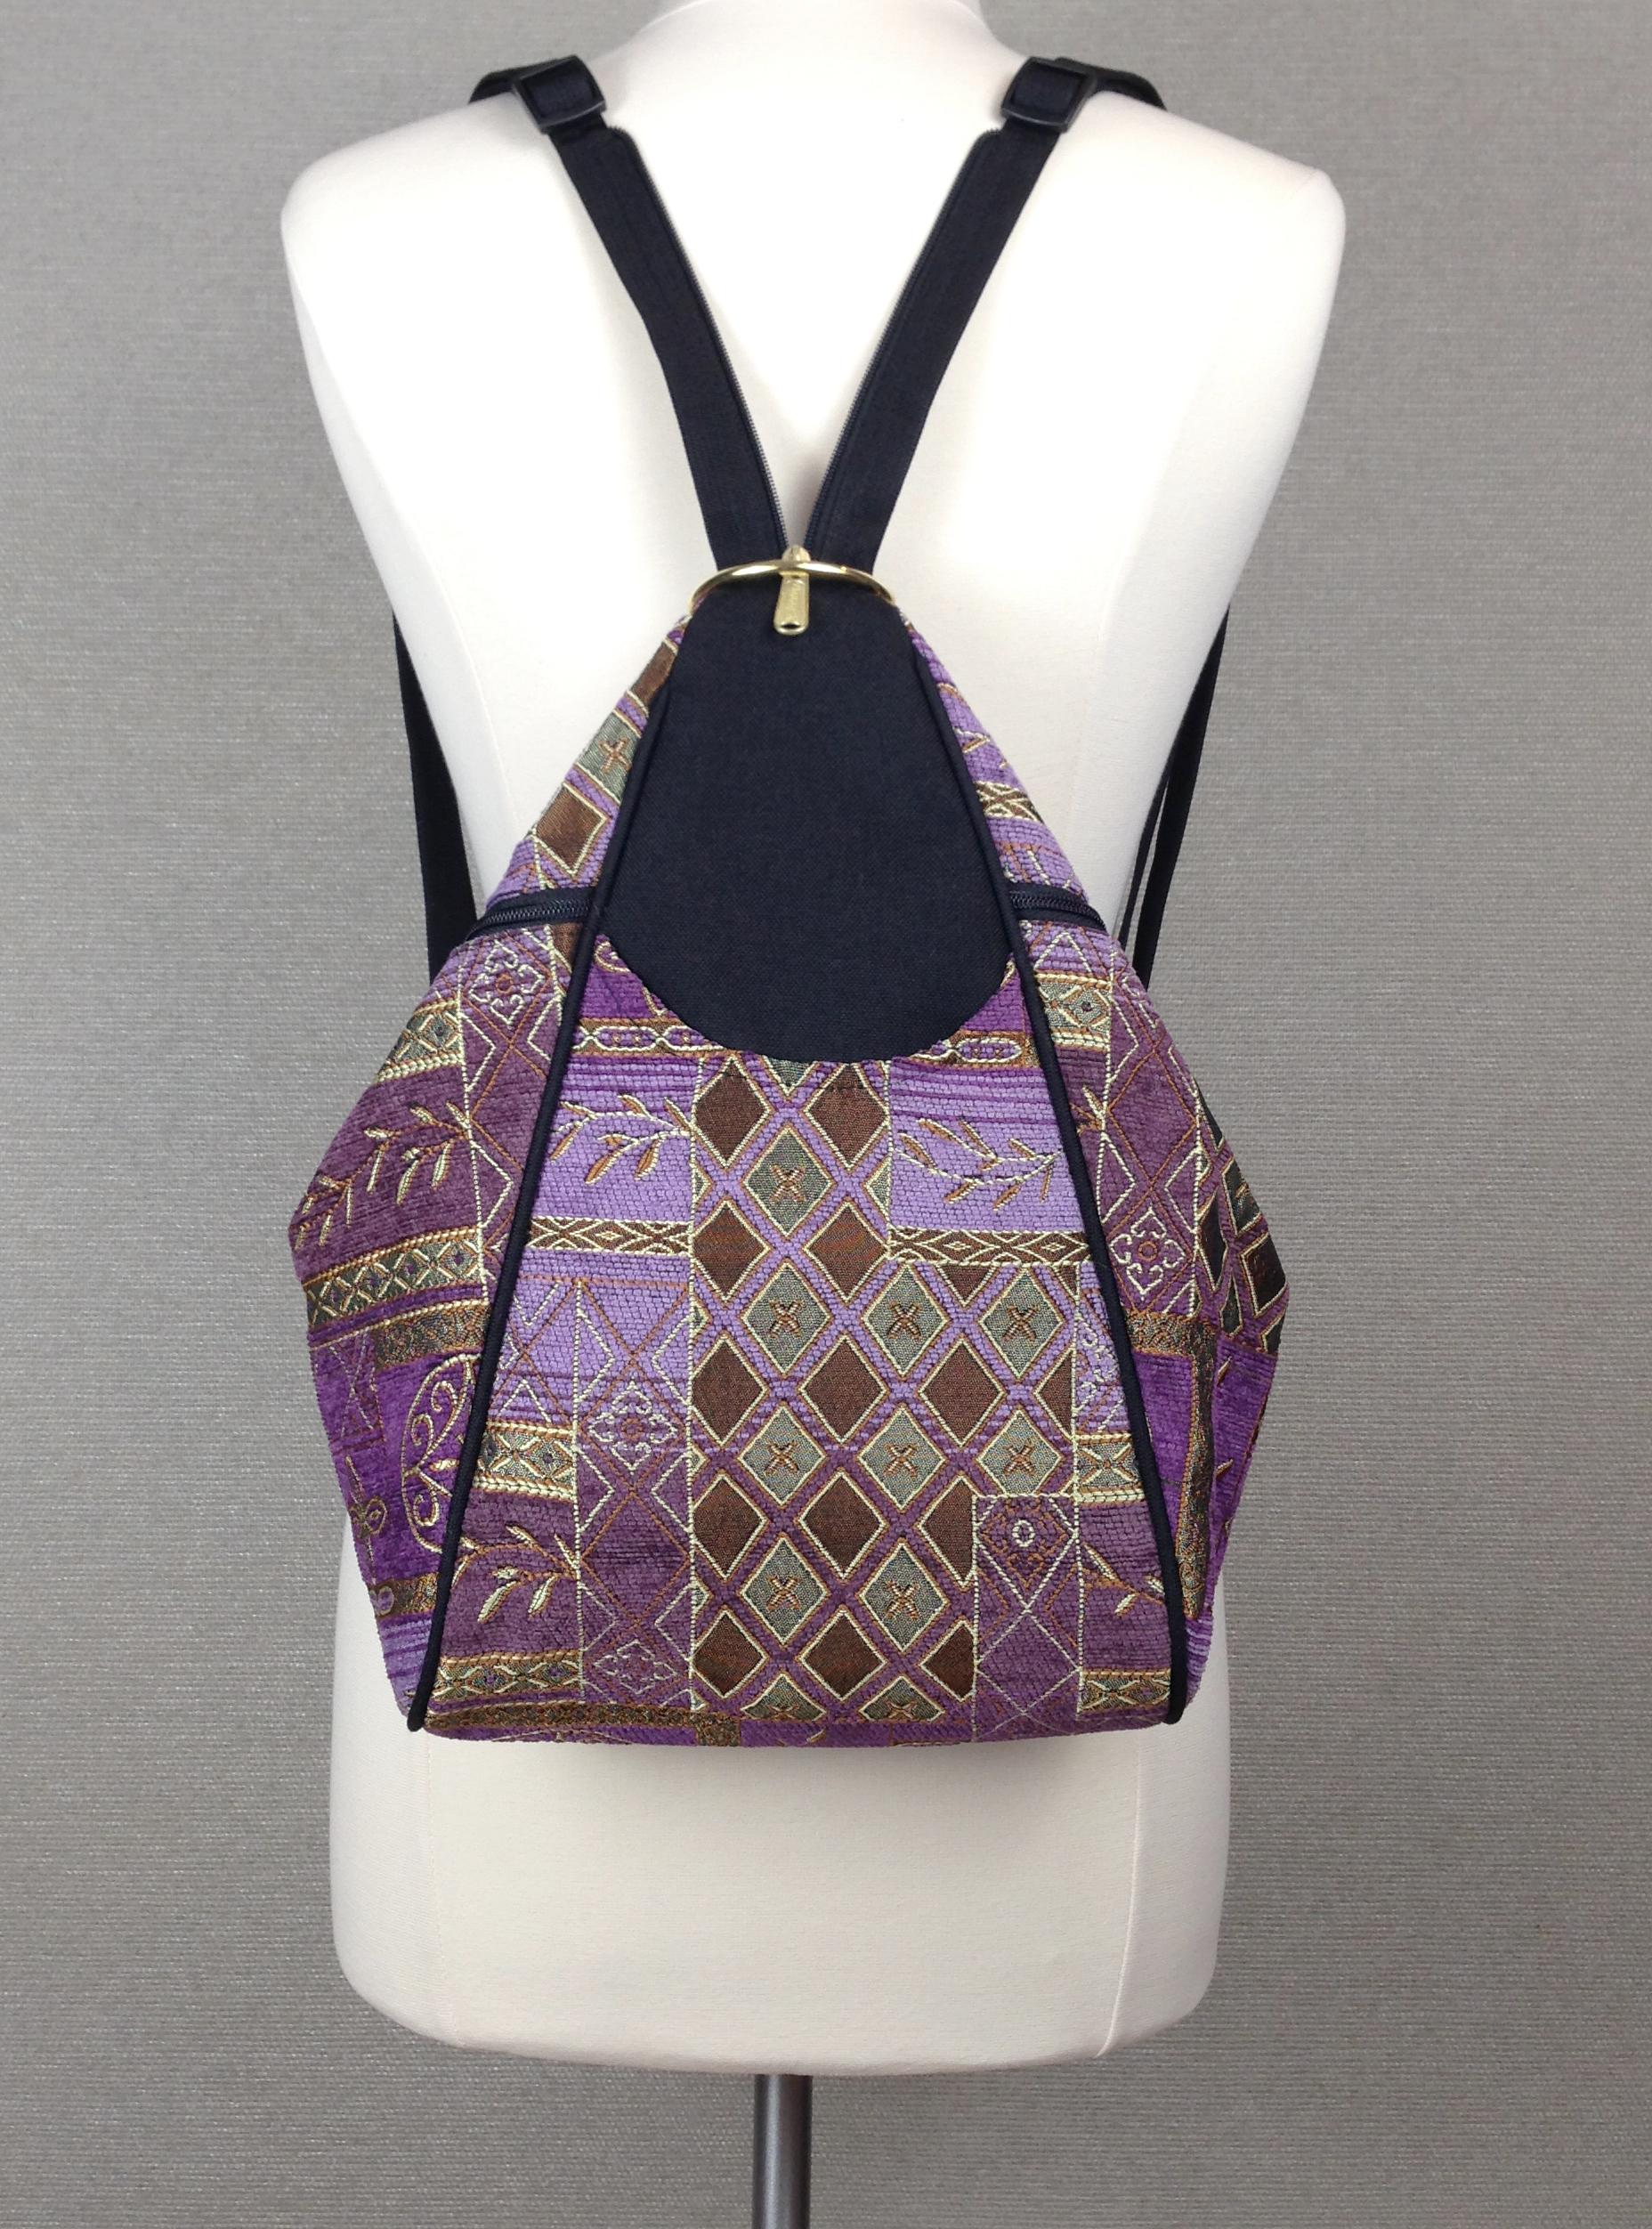 Classic Backpack Neptune Purple